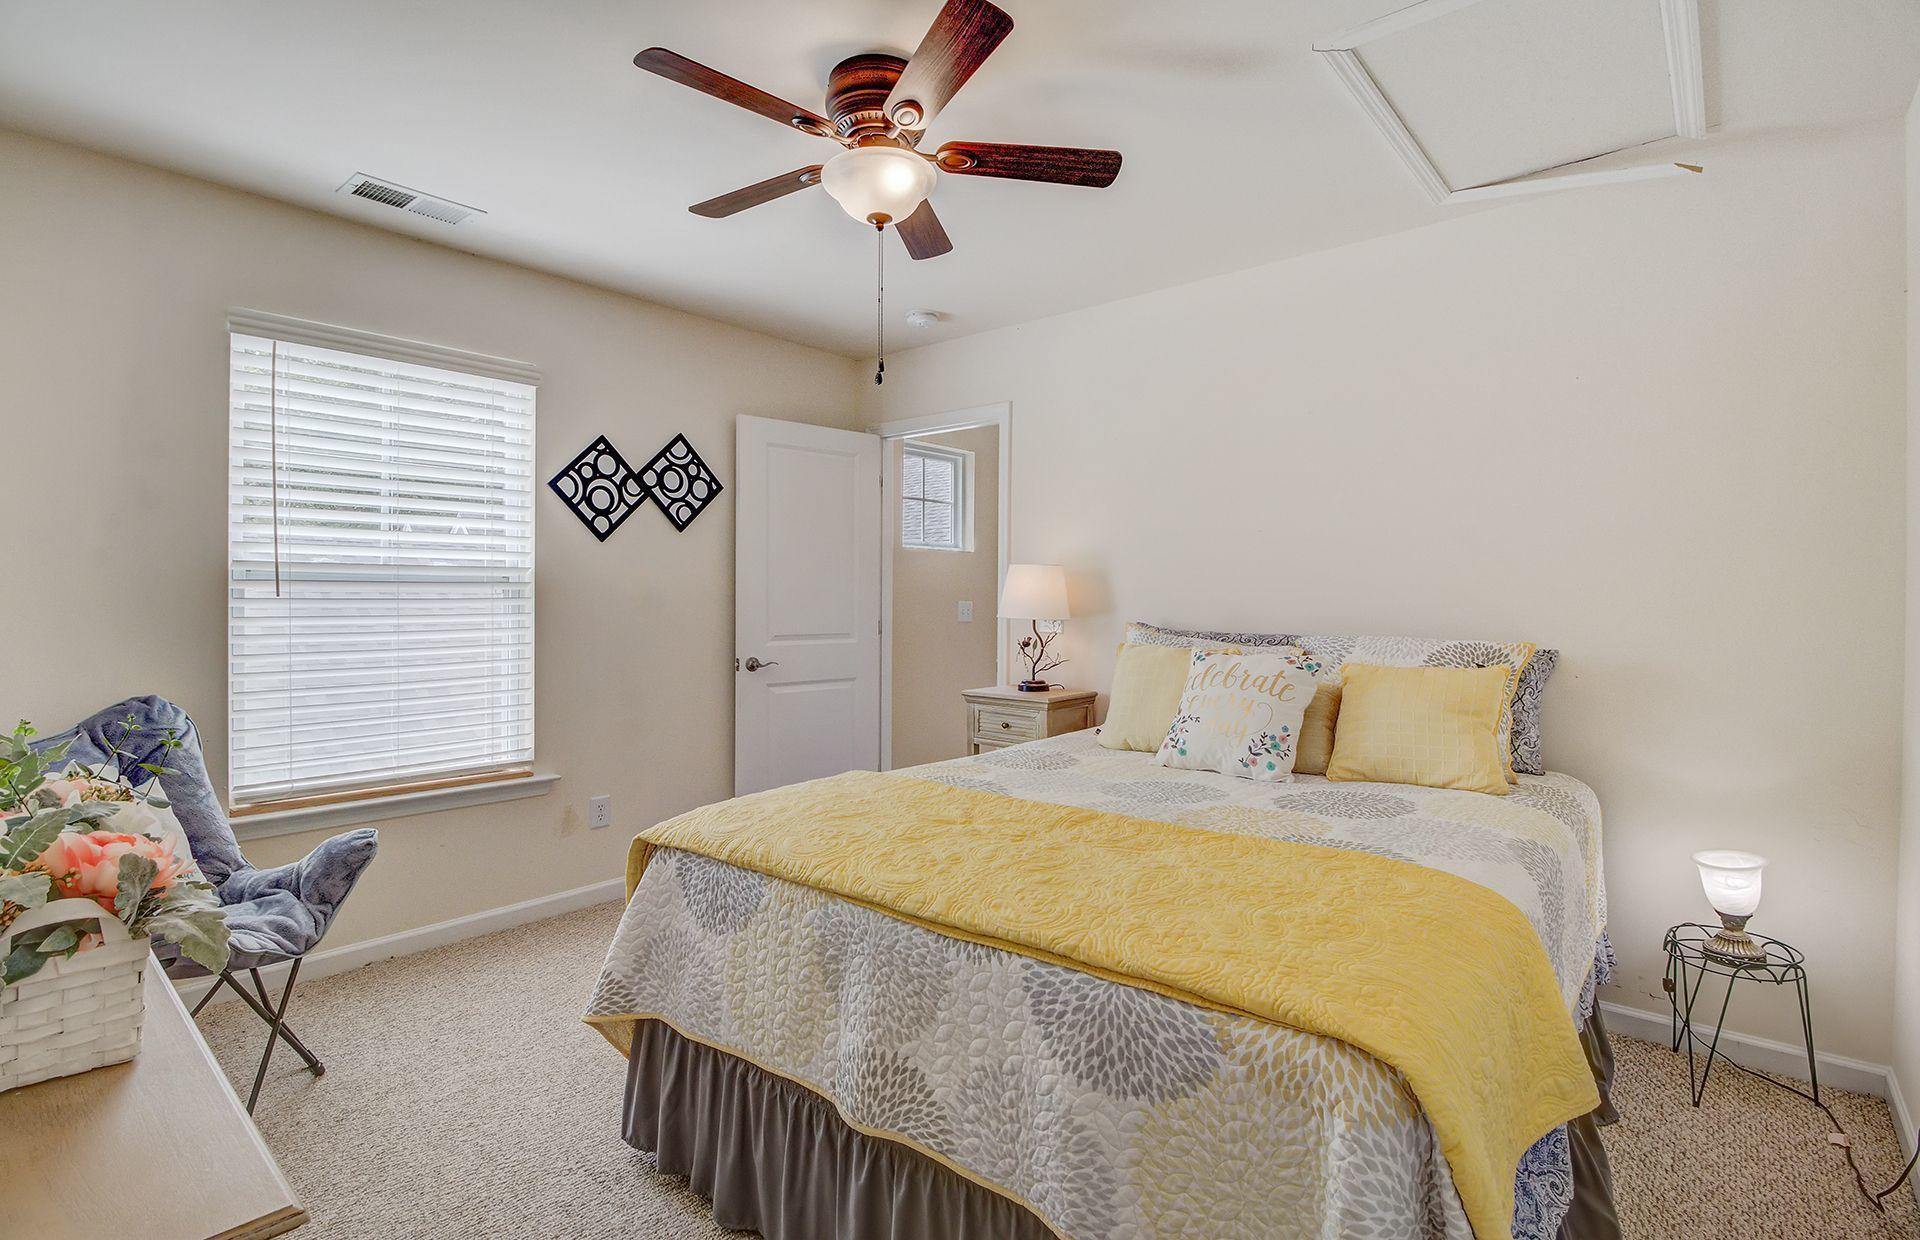 Linnen Place Homes For Sale - 1275 Shingleback, Mount Pleasant, SC - 13